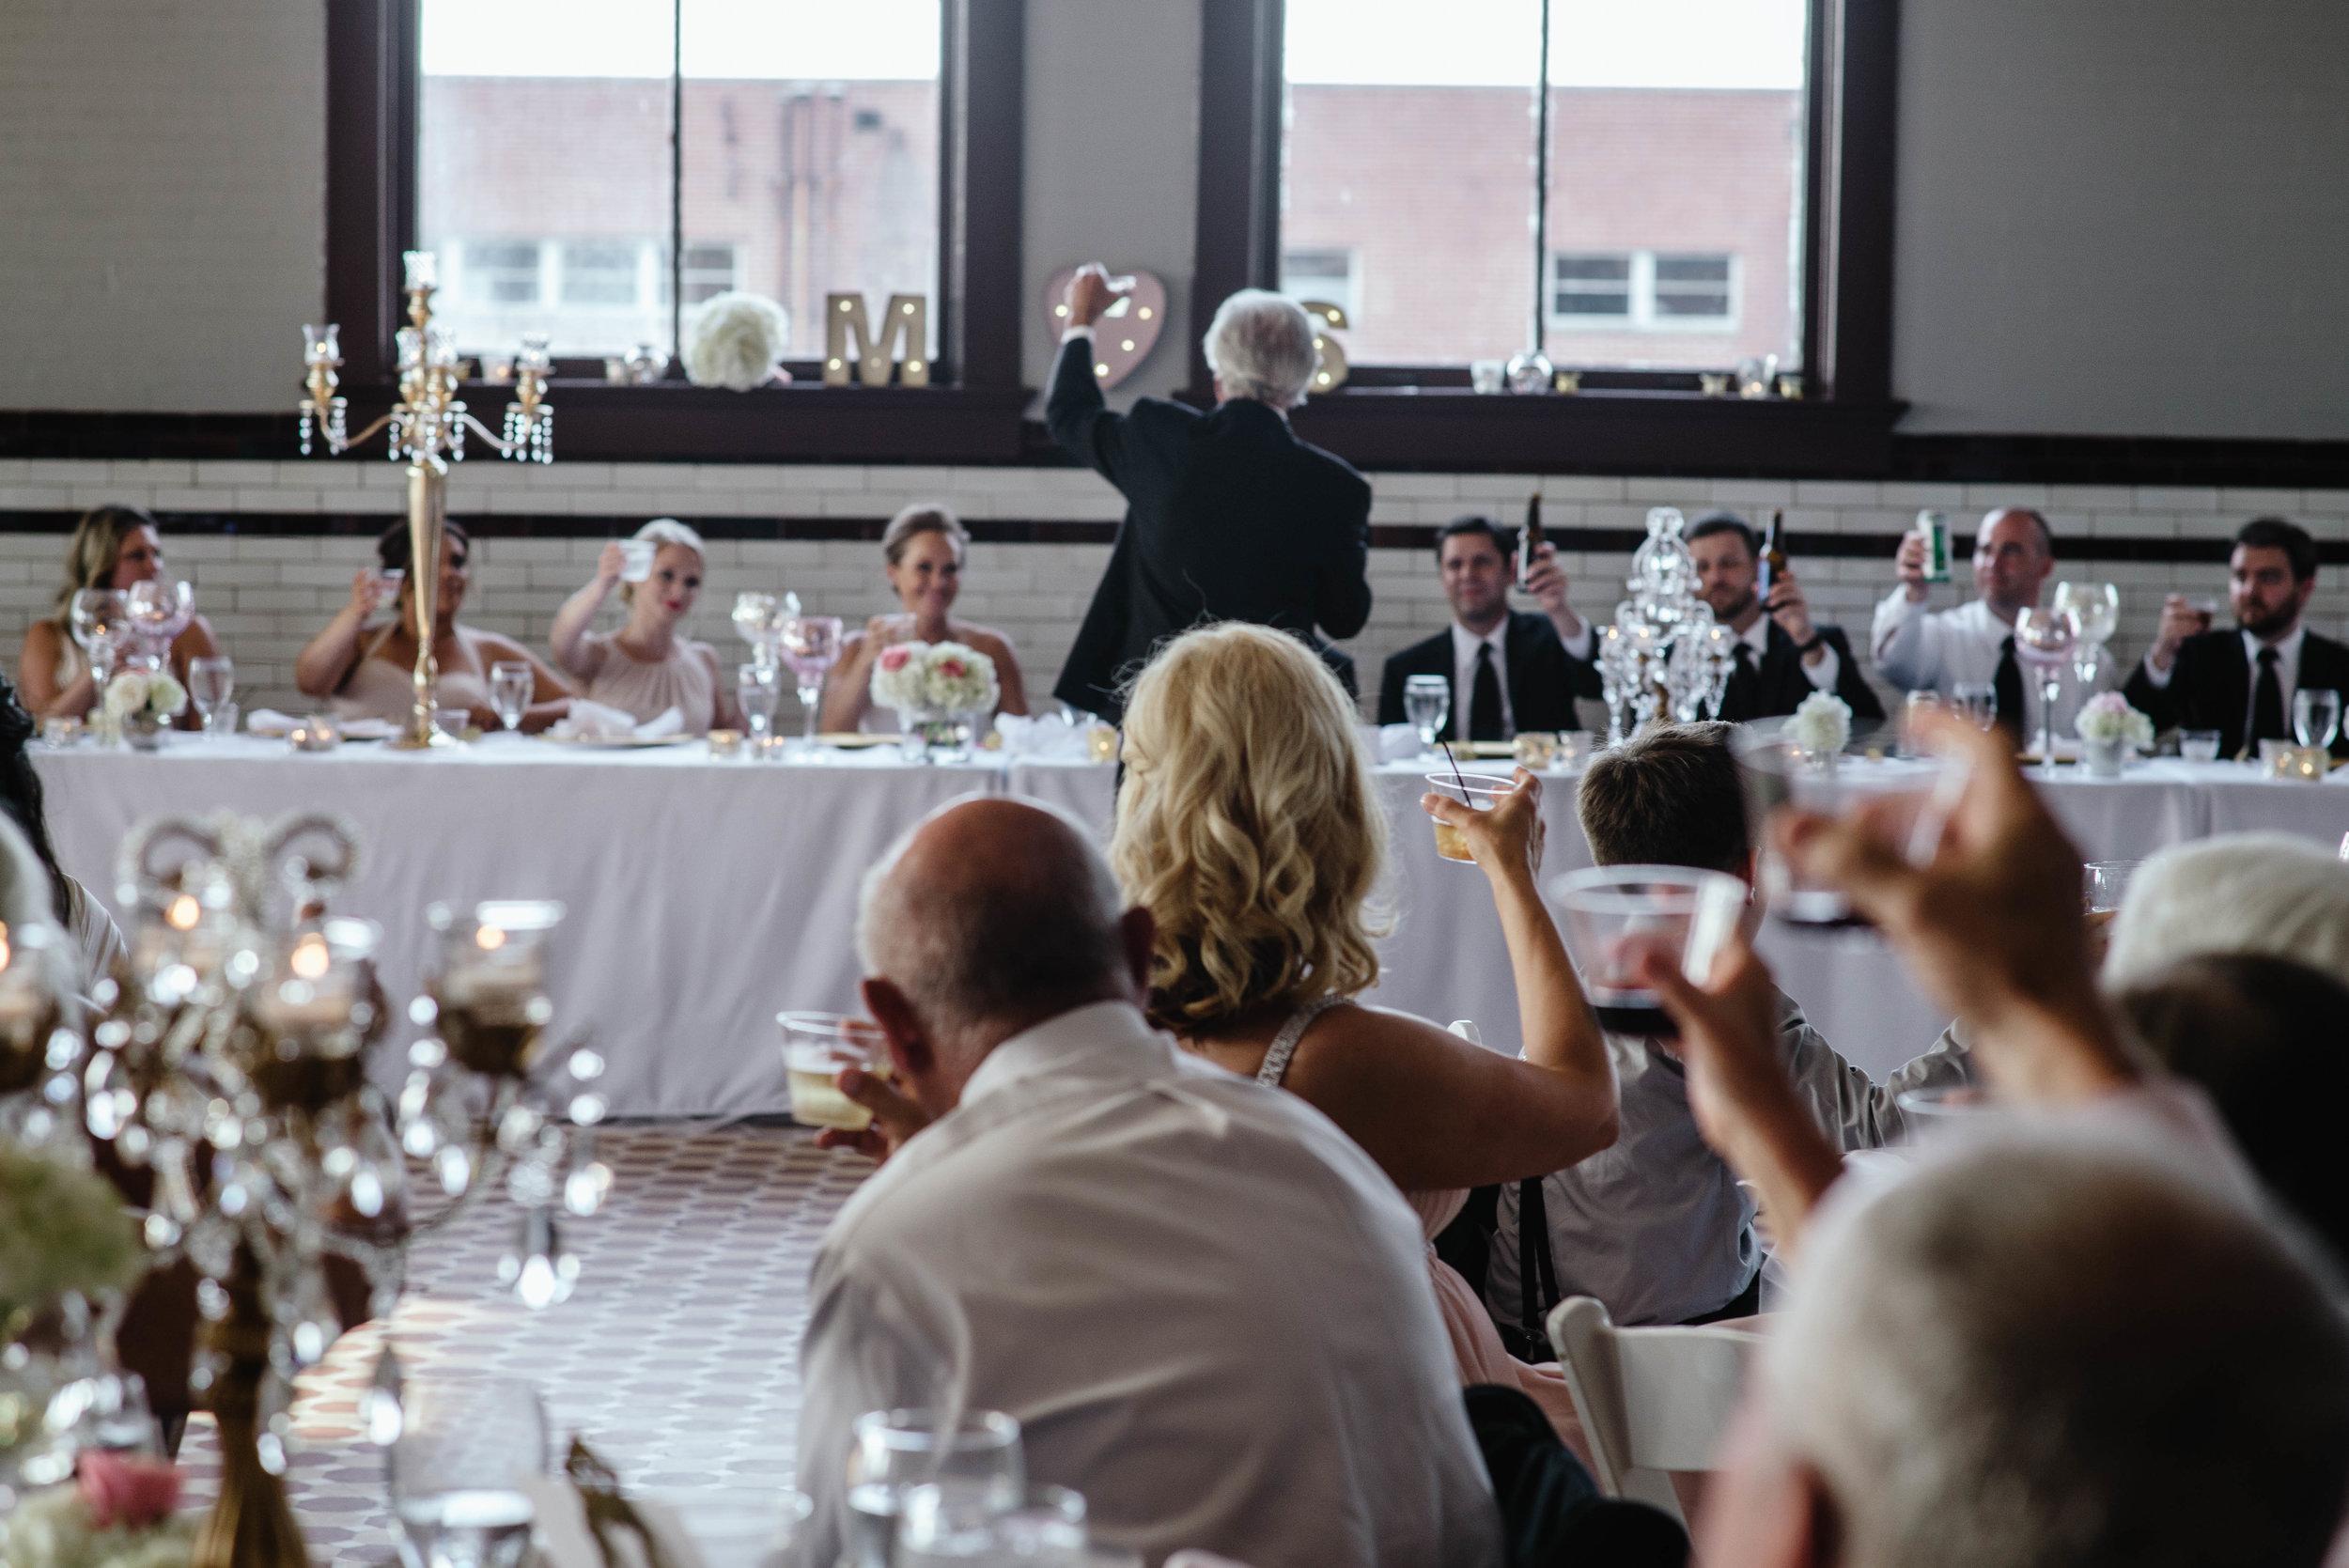 Mina-Steve-Blog-Indianapolis-Wedding-138.jpg